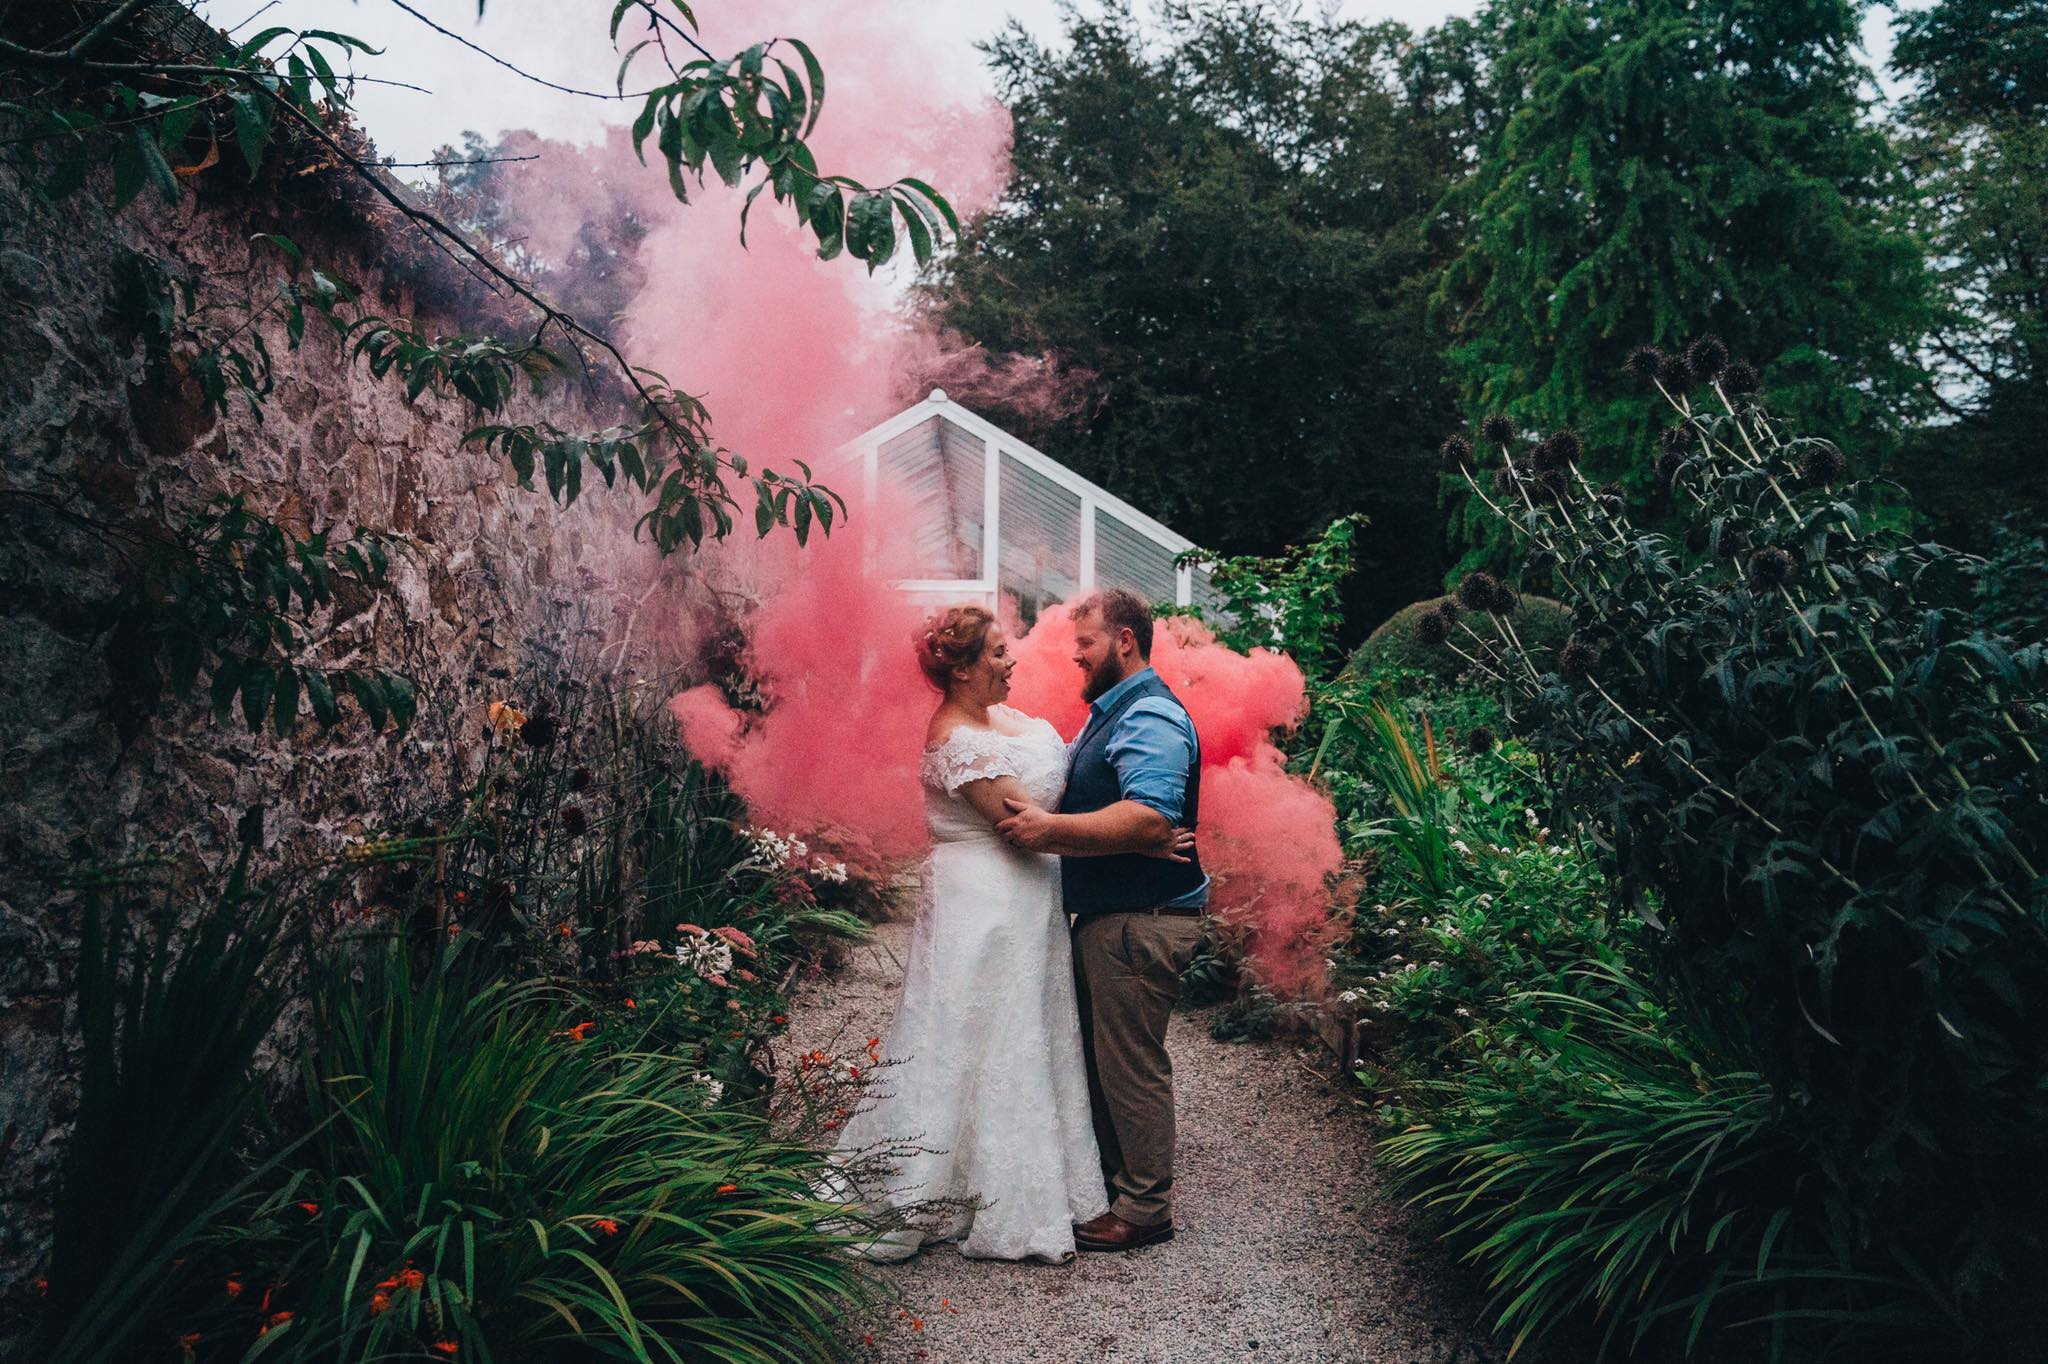 smoke-bomb-wedding-pyro.jpg